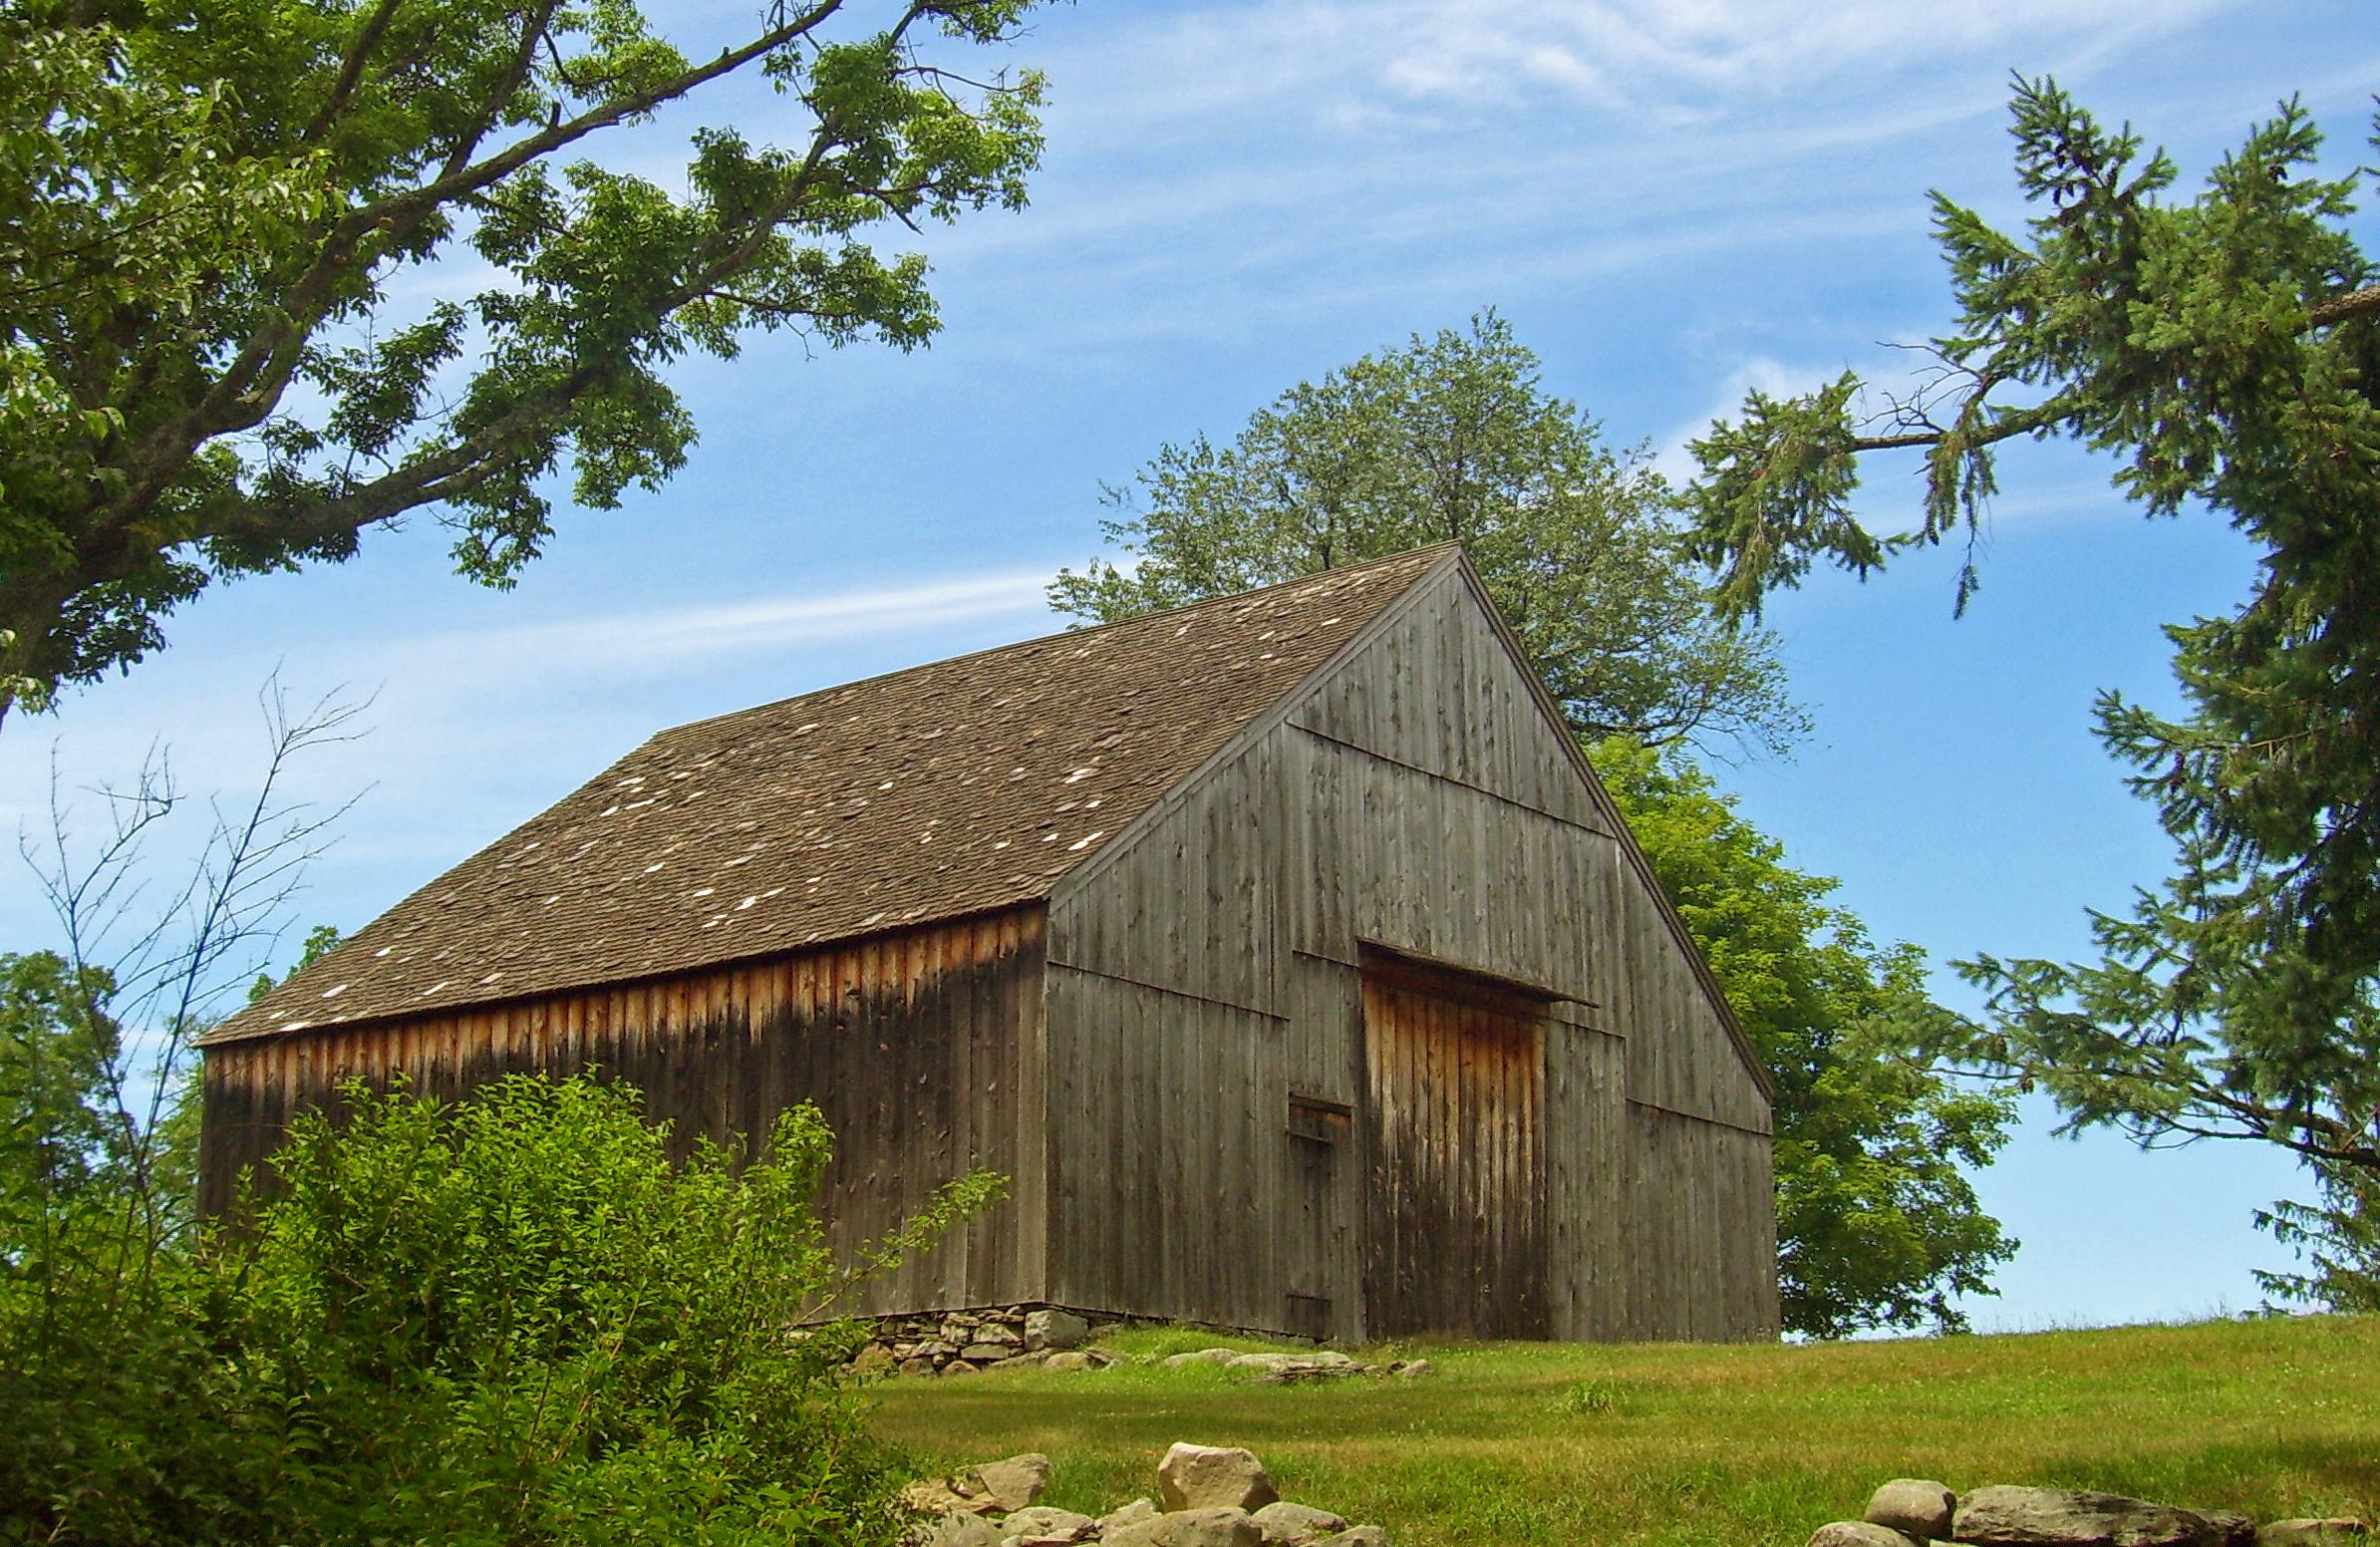 Http Commons Wikimedia Org Wiki File Bull Stone House New World Dutch Barn Hamptonburgh Ny Jpg